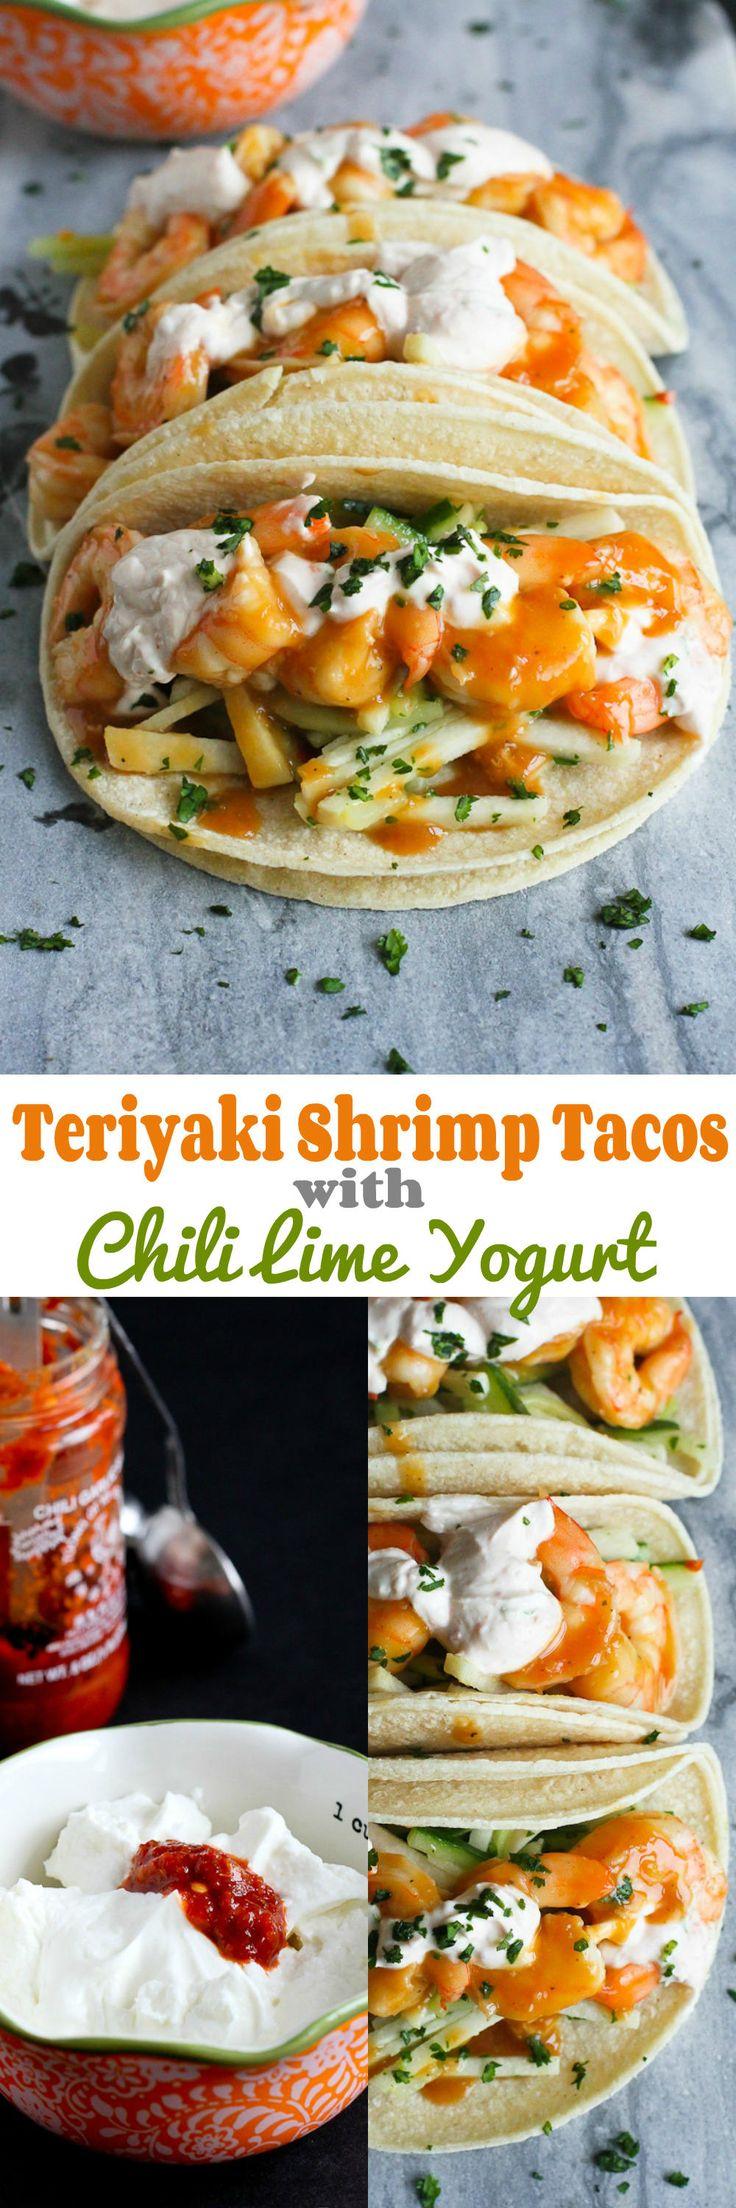 Teriyaki Shrimp Tacos with Chili Lime Yogurt Recipe